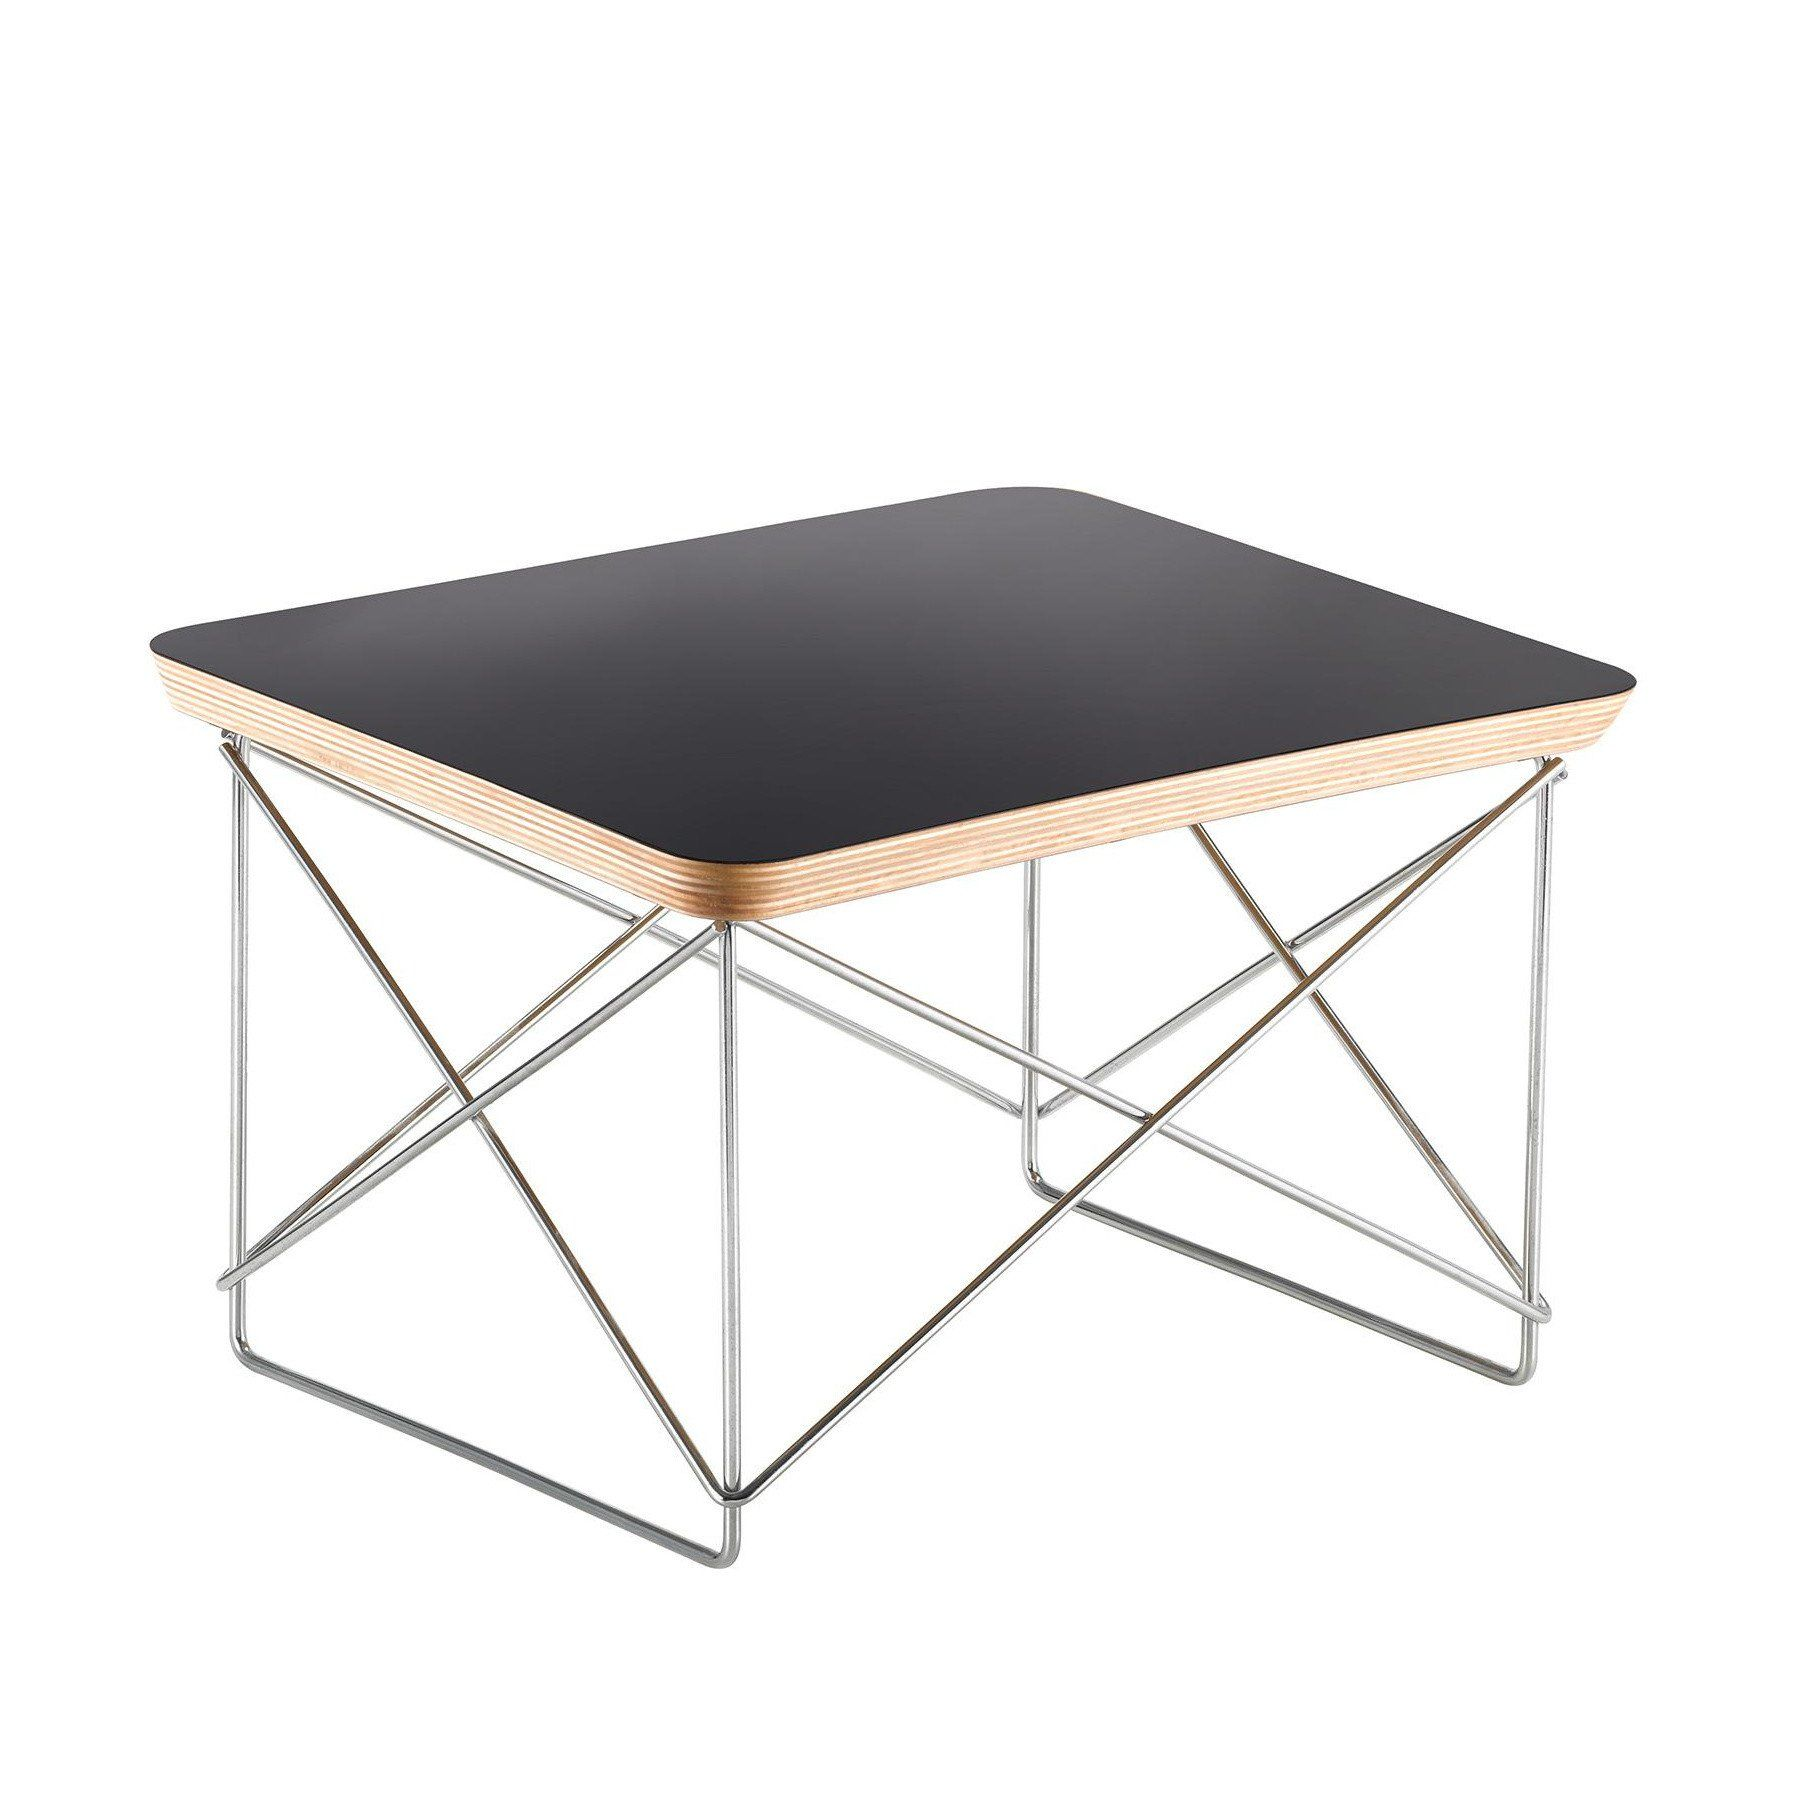 Vitra   Occasional Table LTR Side Table   Black/oak ...